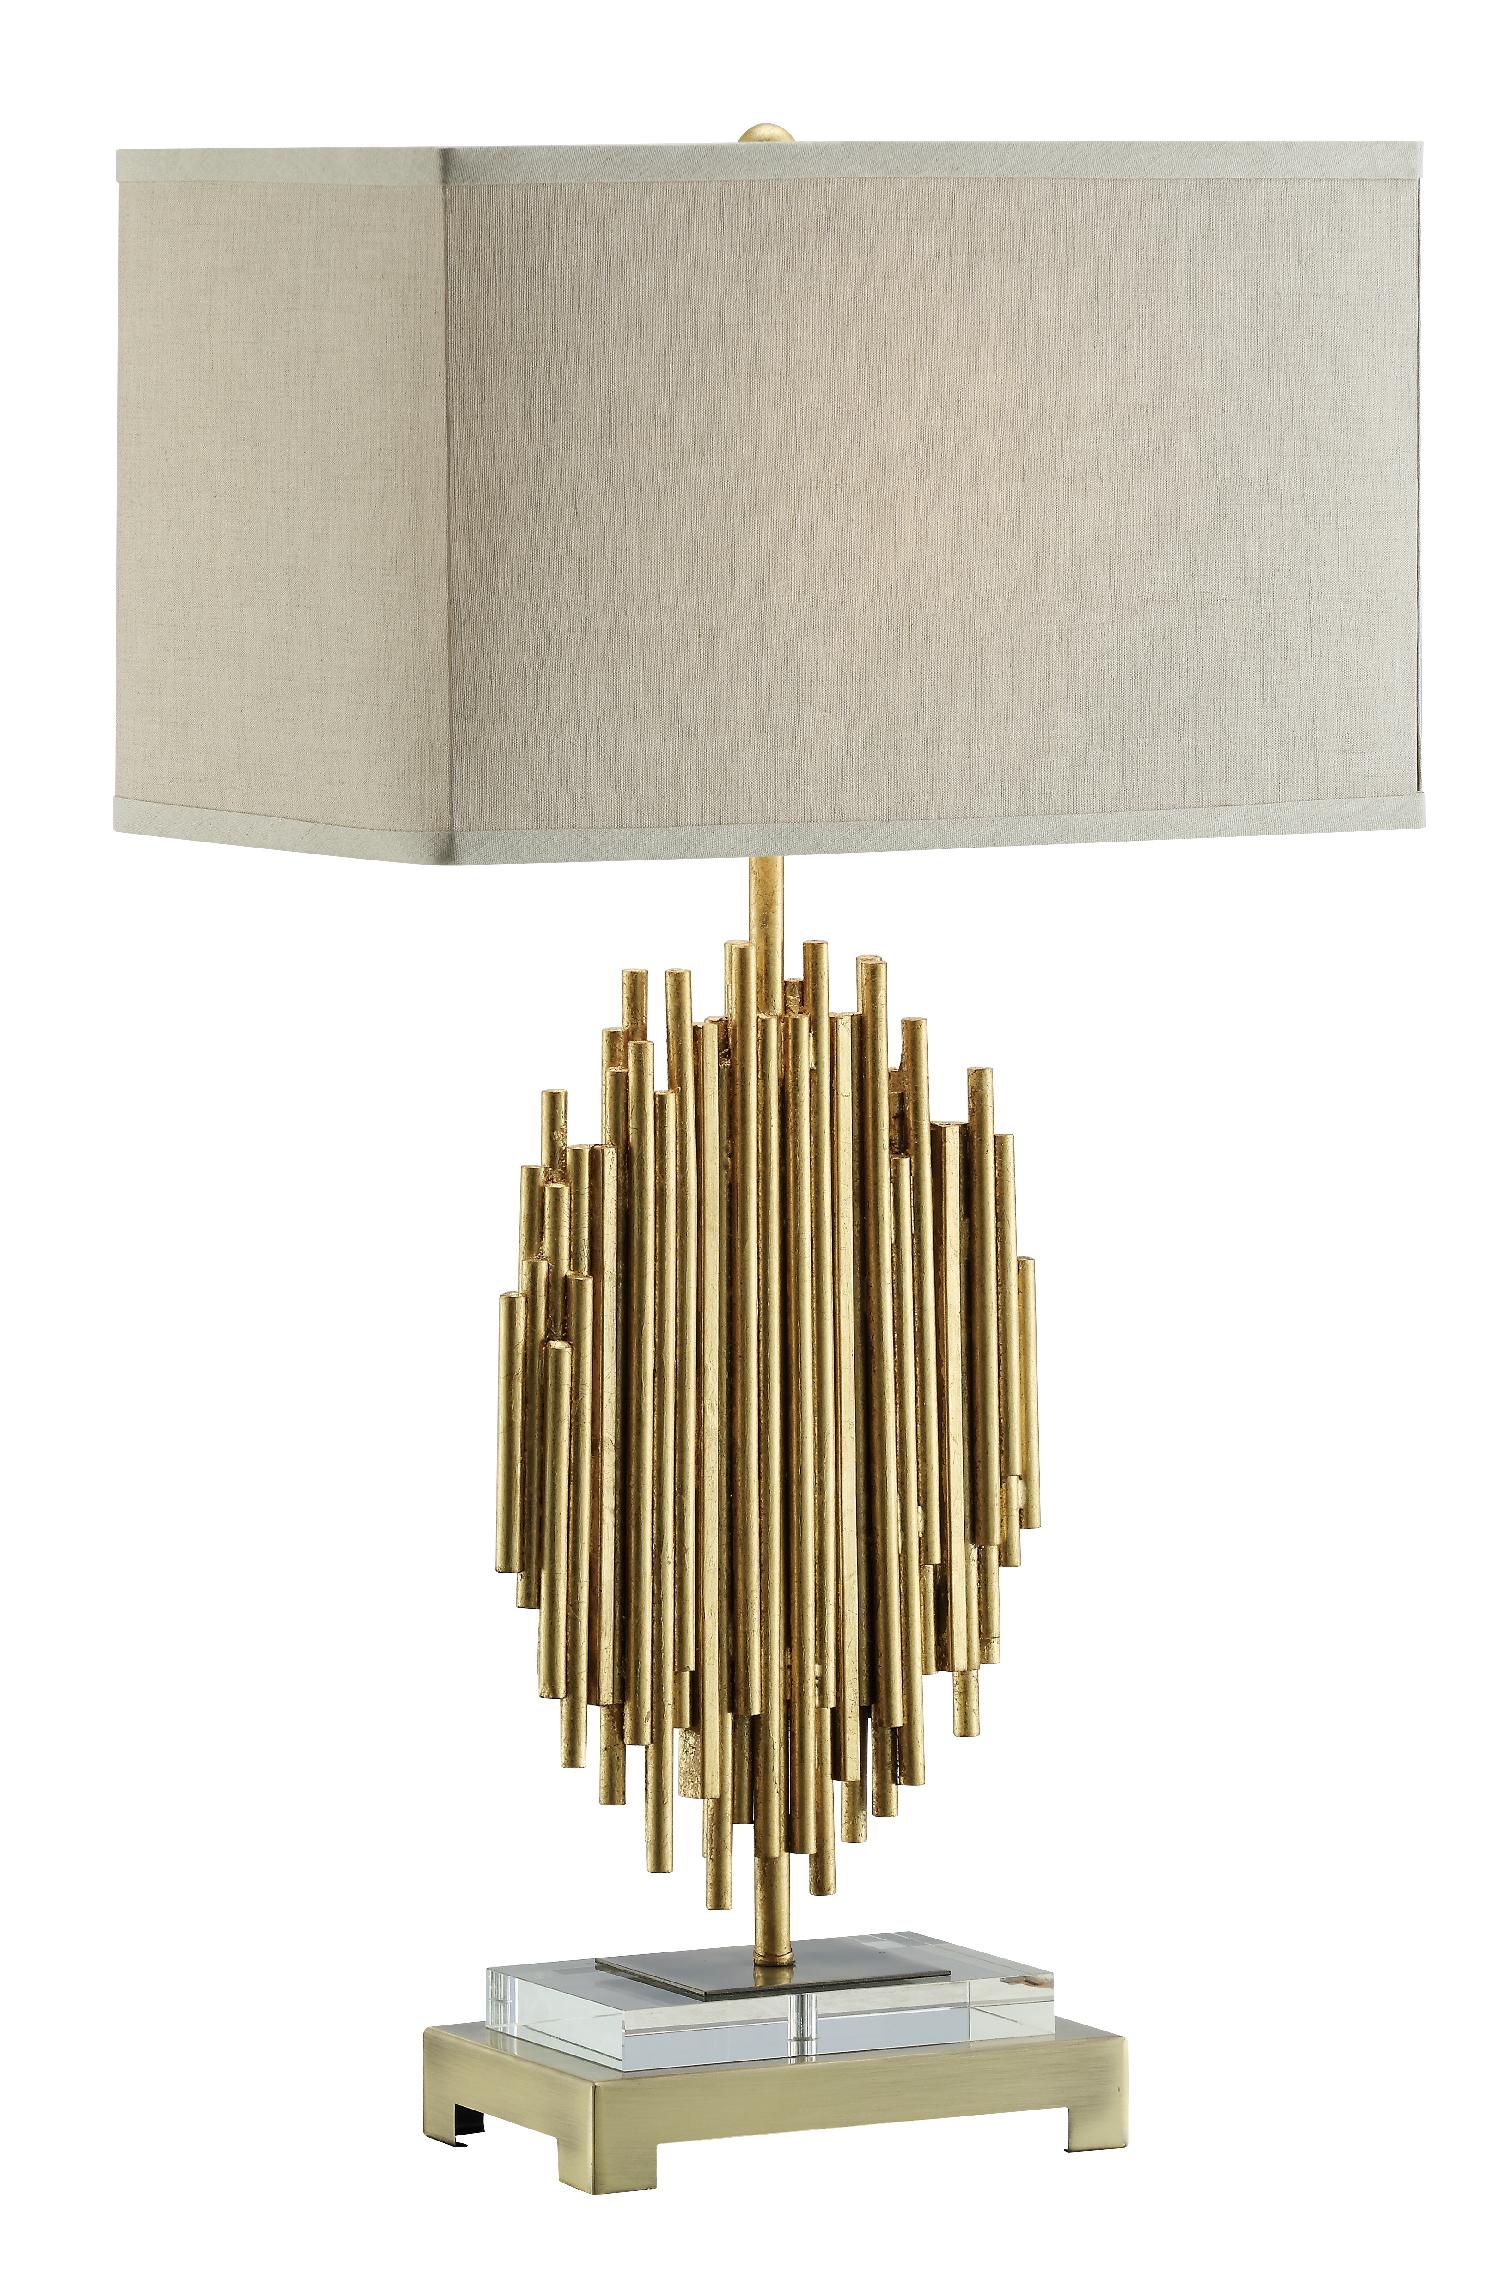 NEW Pair of Zonfir Lamps